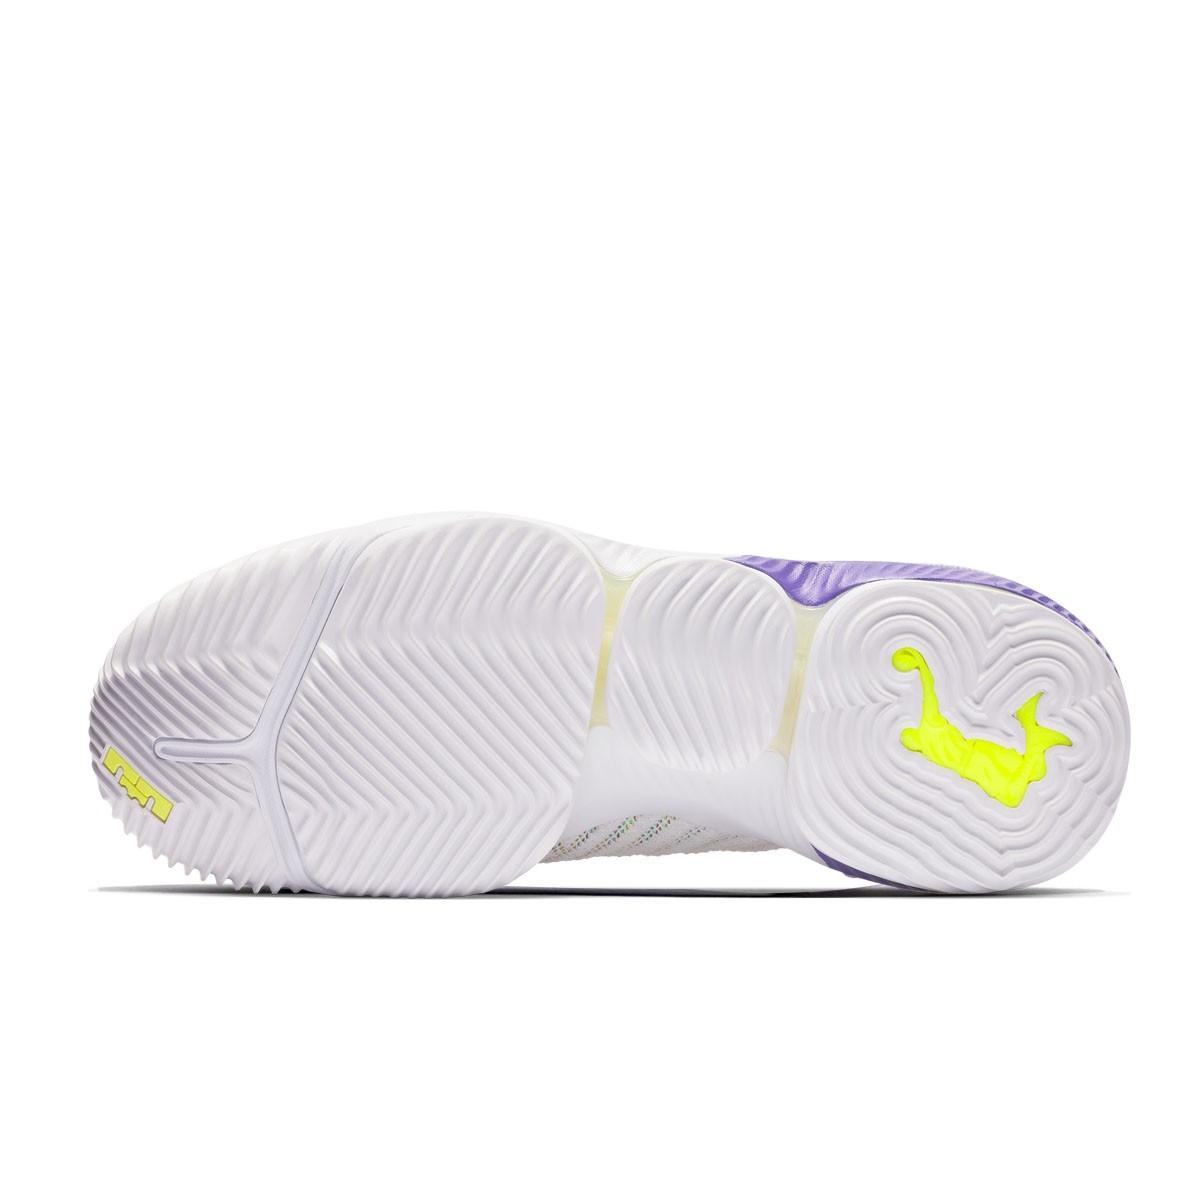 c9699f0135f9 Buy Nike Lebron XVI  Buzz Lightyear  Basketball shoes   sneakers